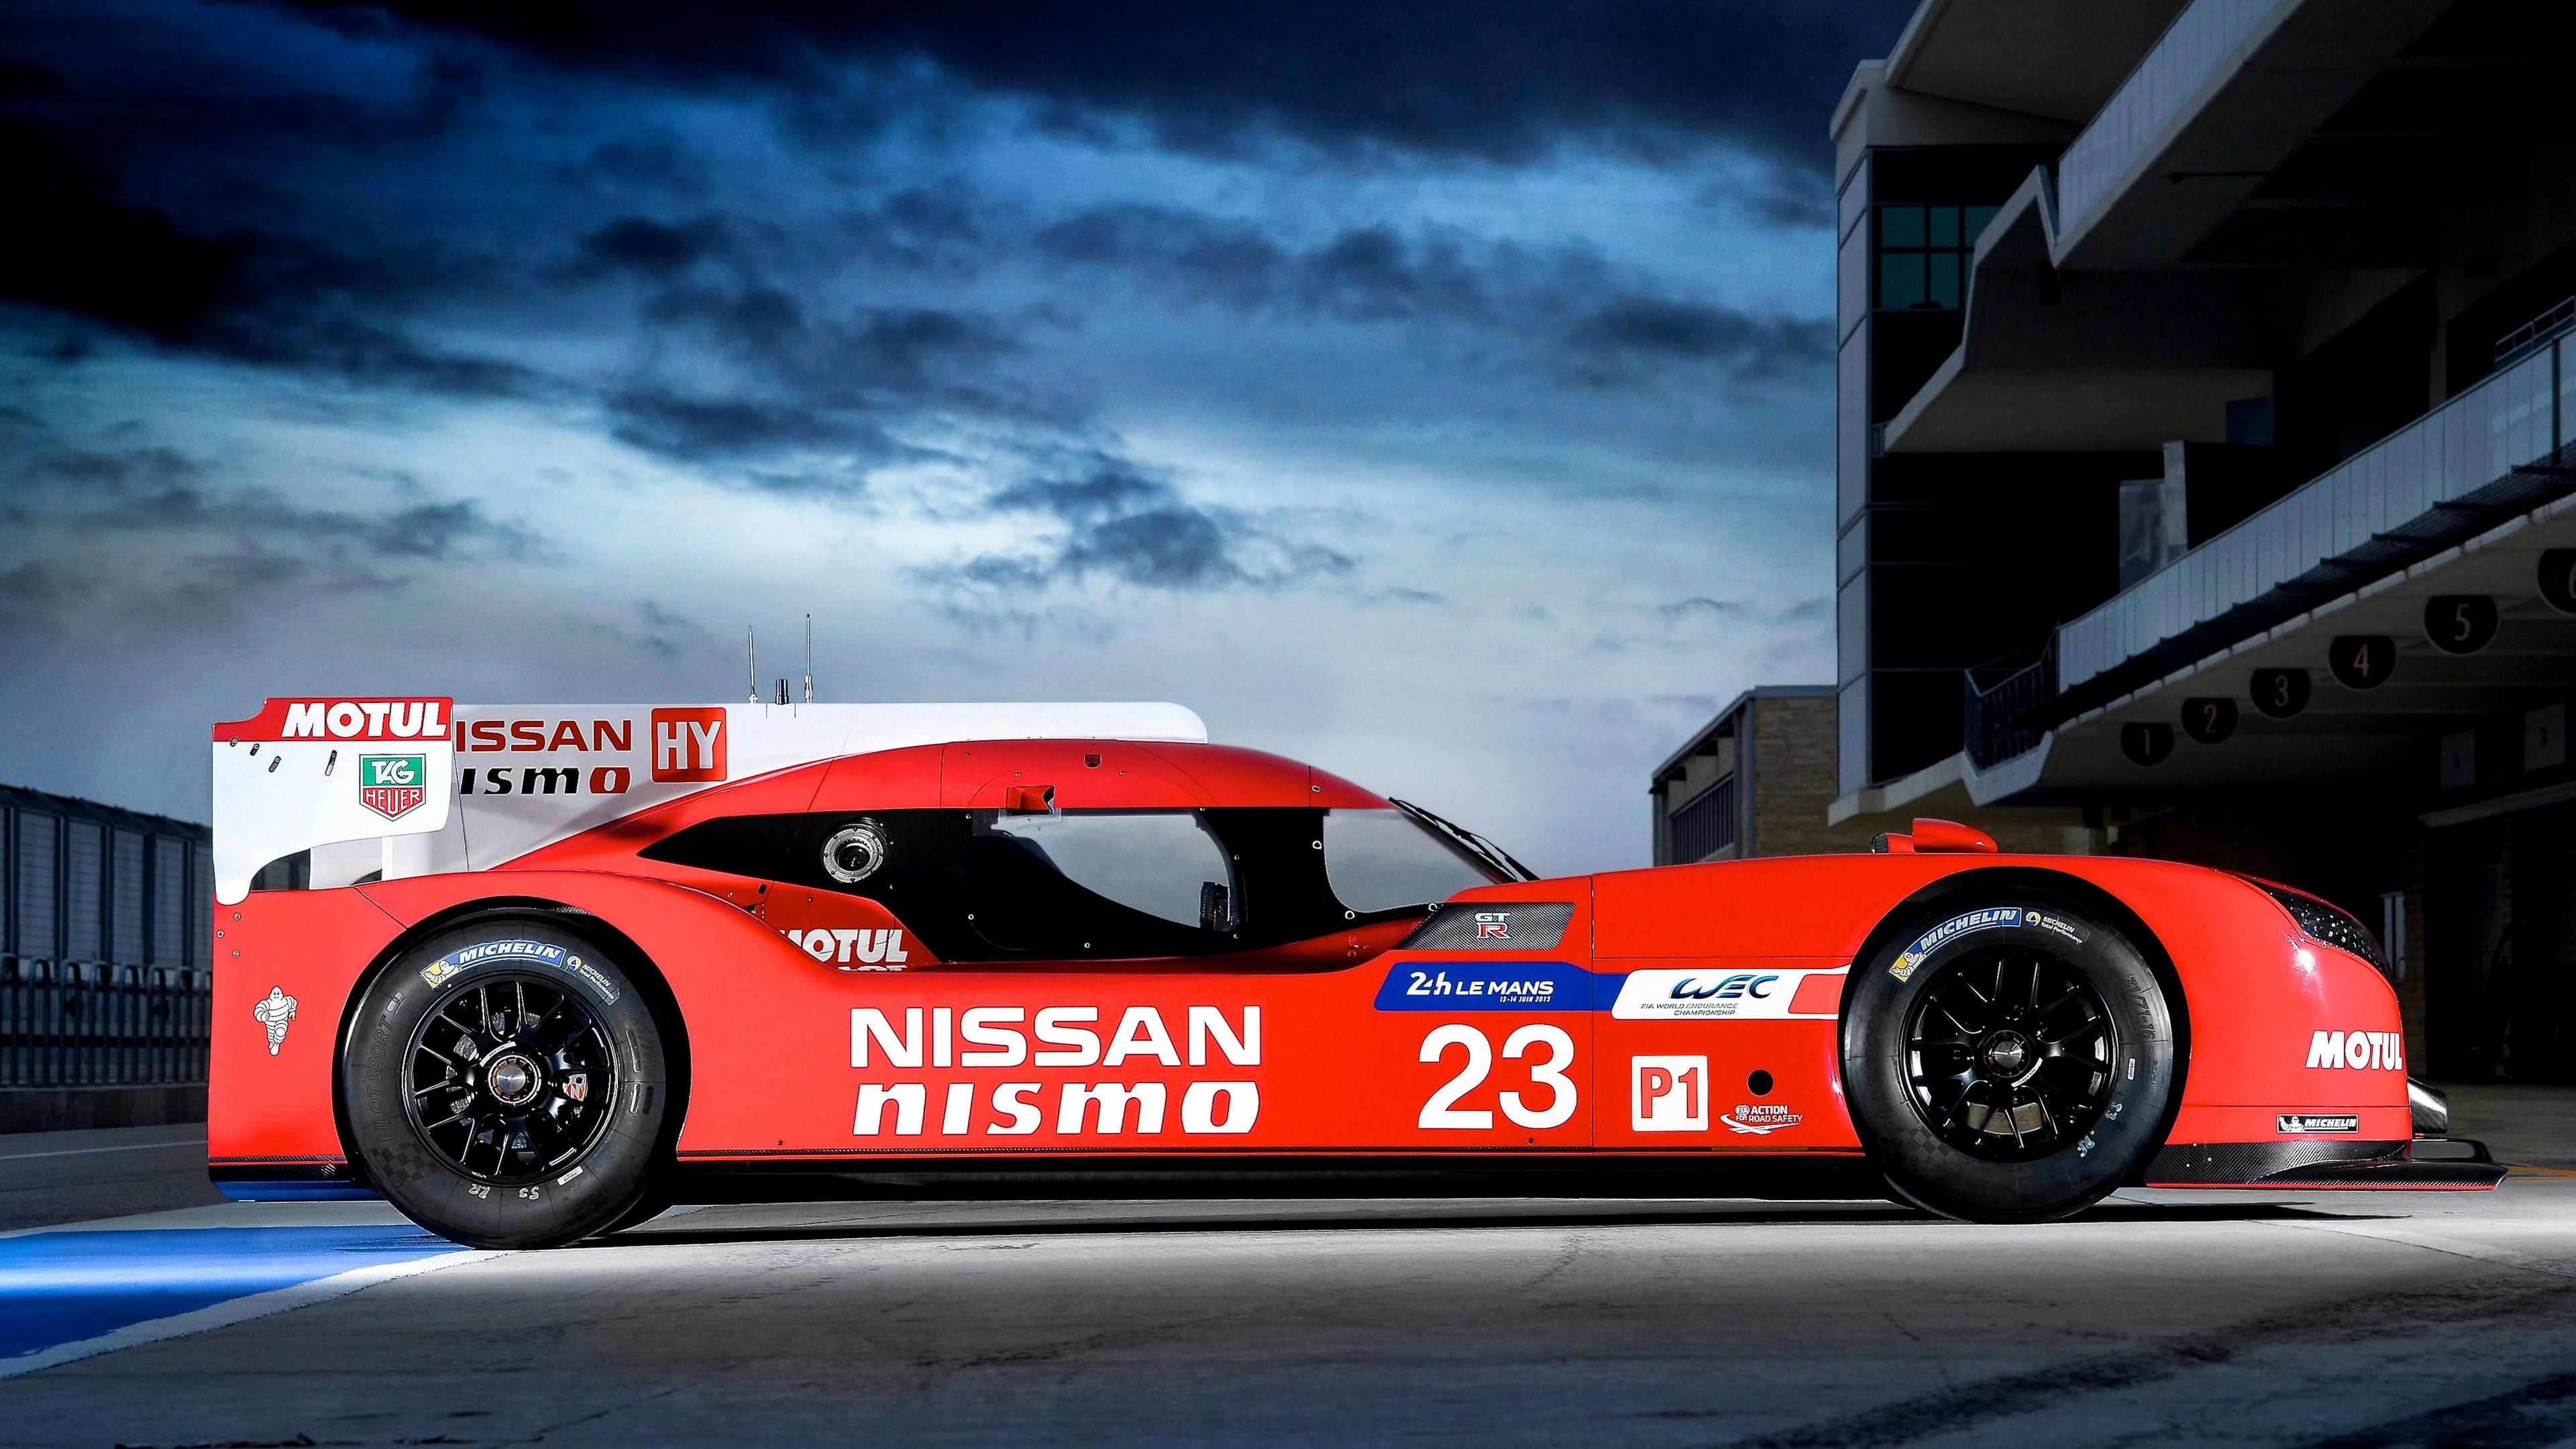 nissan gtr lm nismo 2016 1539104560 - Nissan GTR LM Nismo 2016 - nissan wallpapers, nissan gtr wallpapers, cars wallpapers